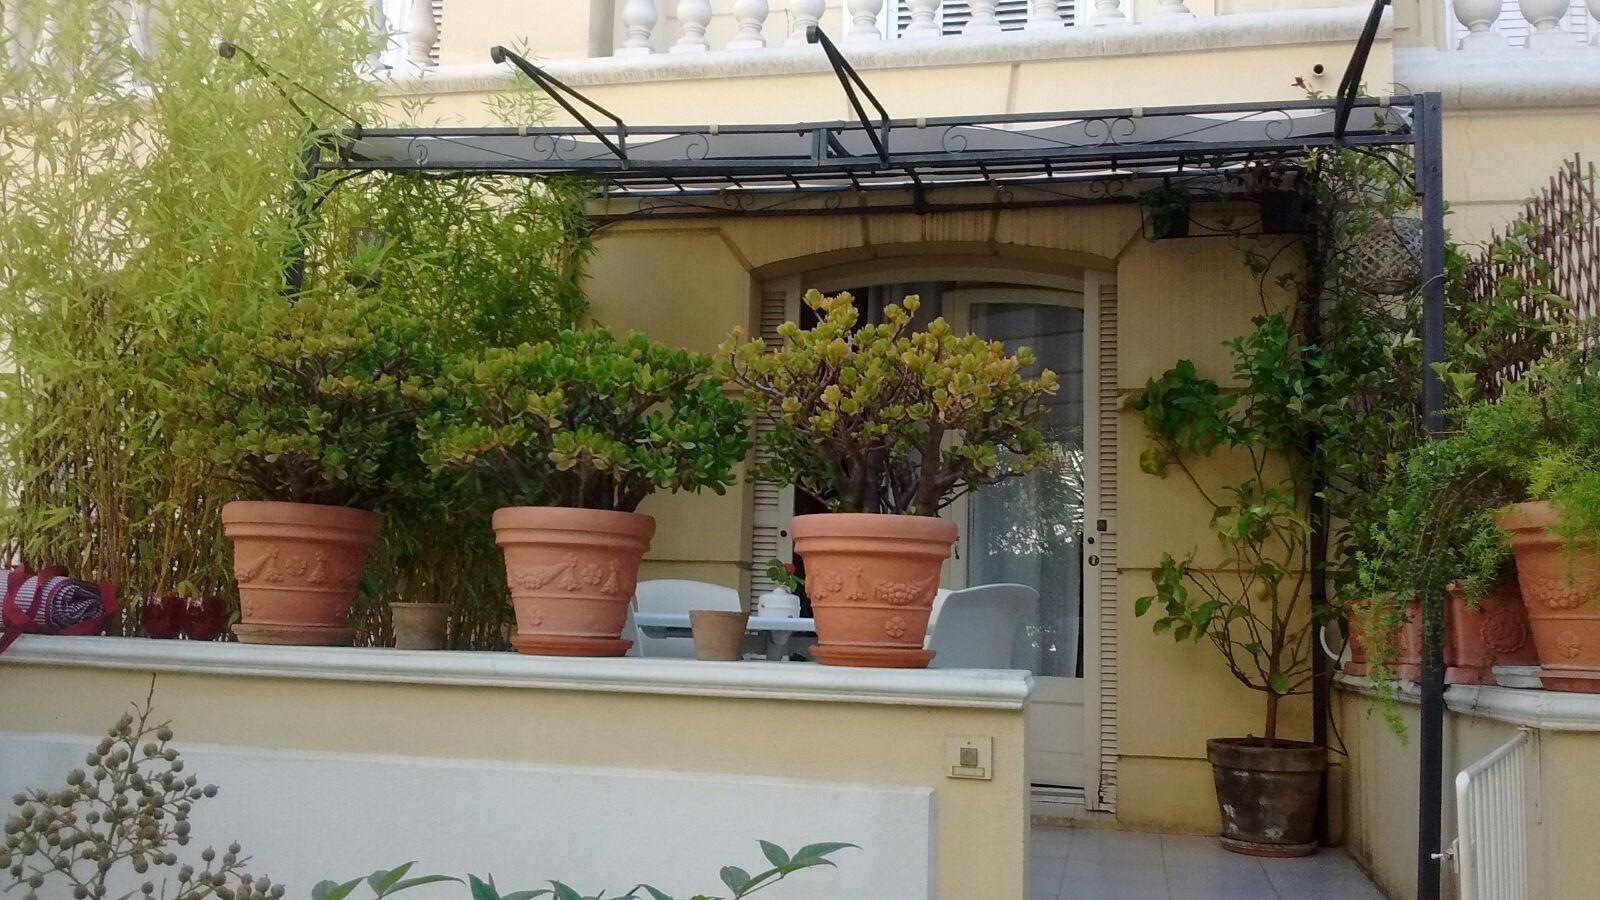 location menton centre ville studio meubl avec grande terrasse. Black Bedroom Furniture Sets. Home Design Ideas